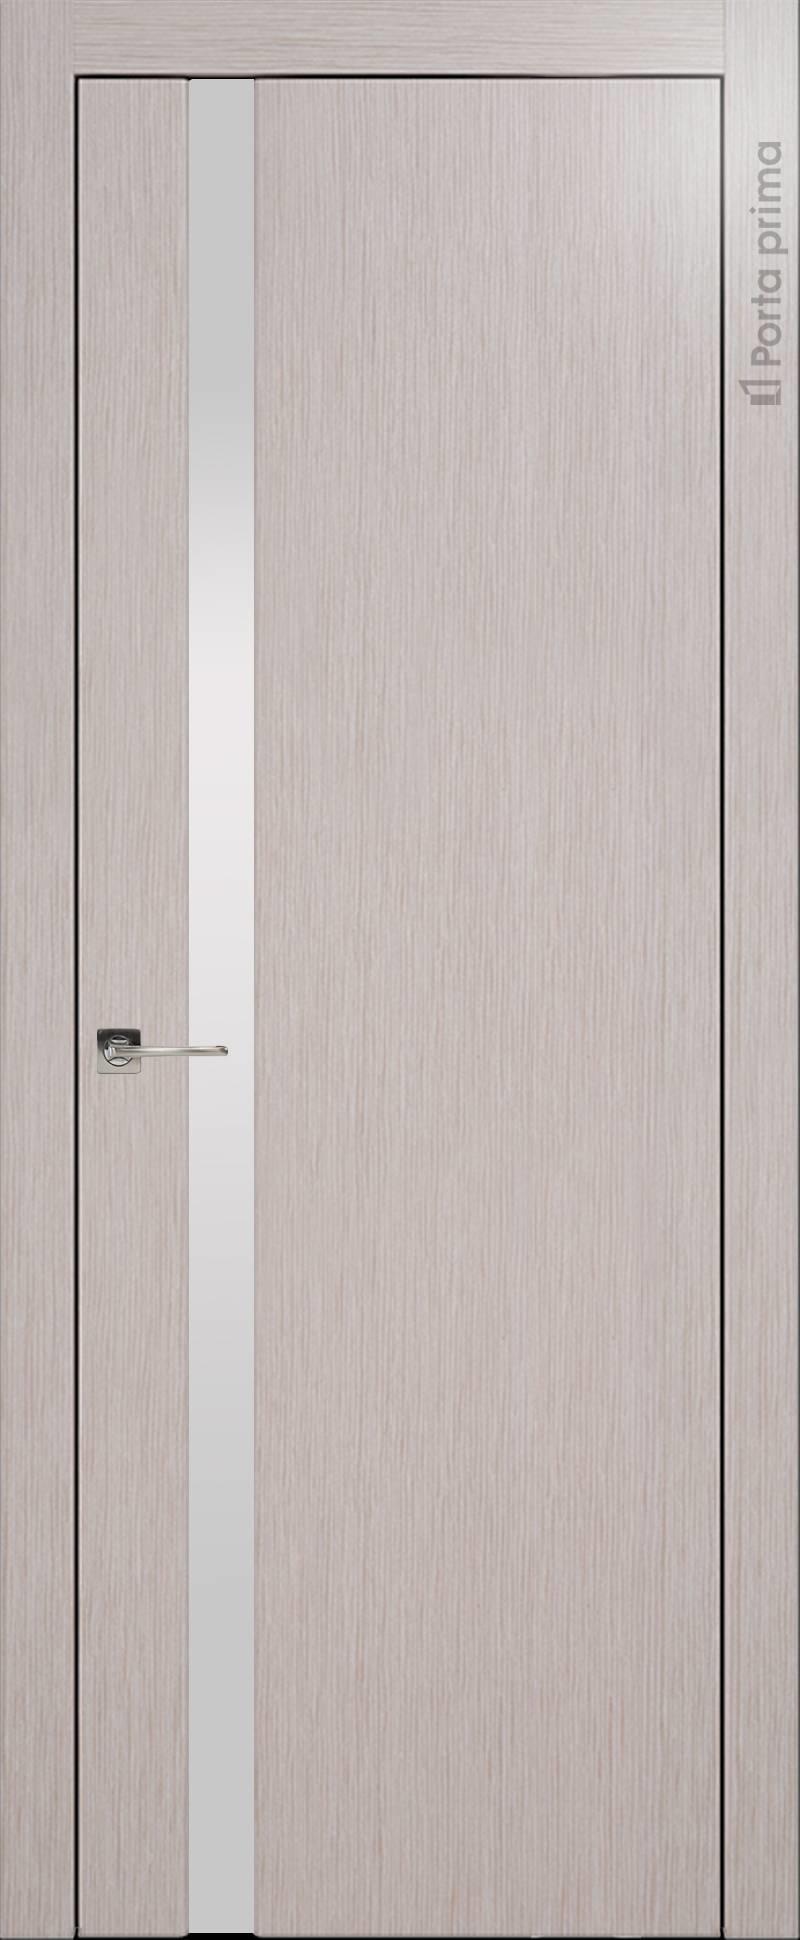 Torino цвет - Дымчатый дуб Без стекла (ДГ)